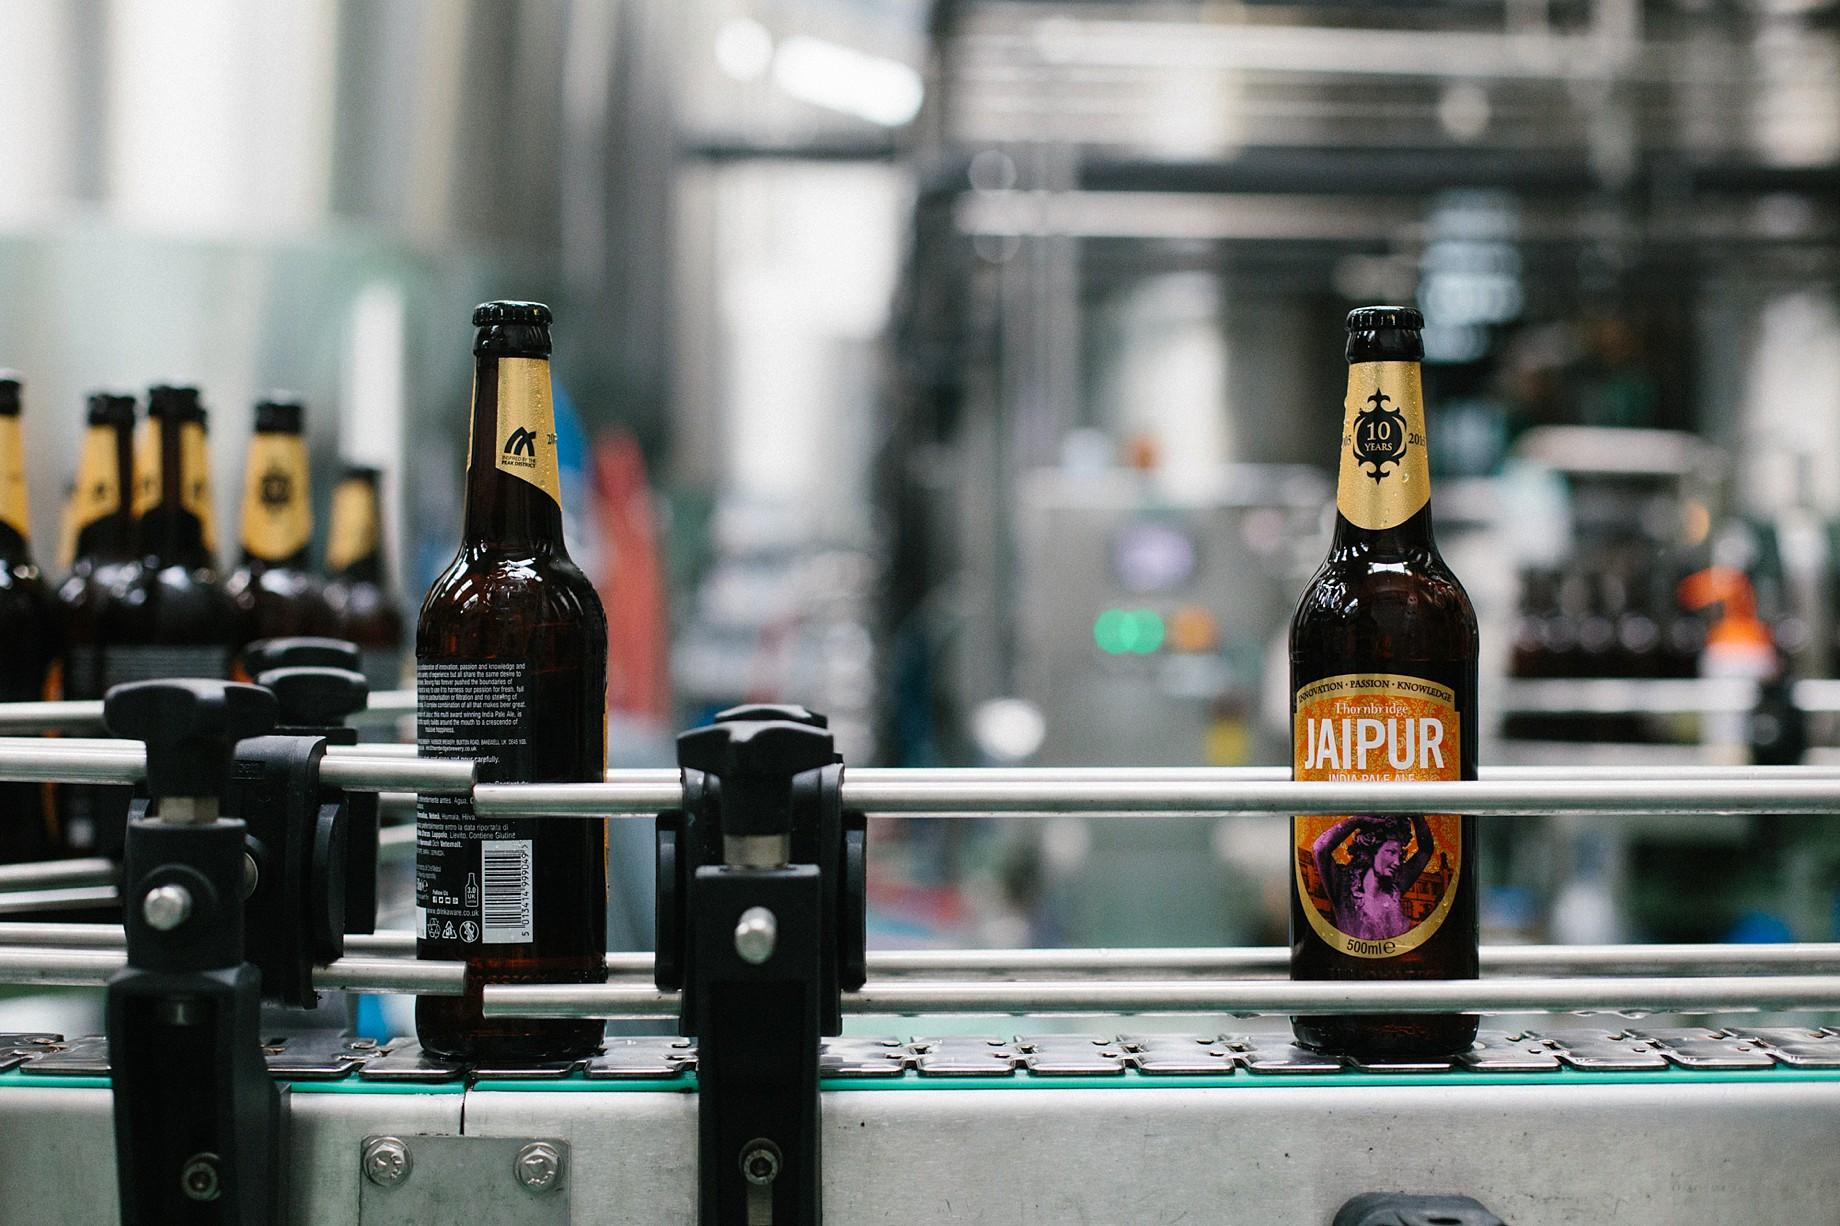 Jaipur Bottling day at Thornbridge Brewery